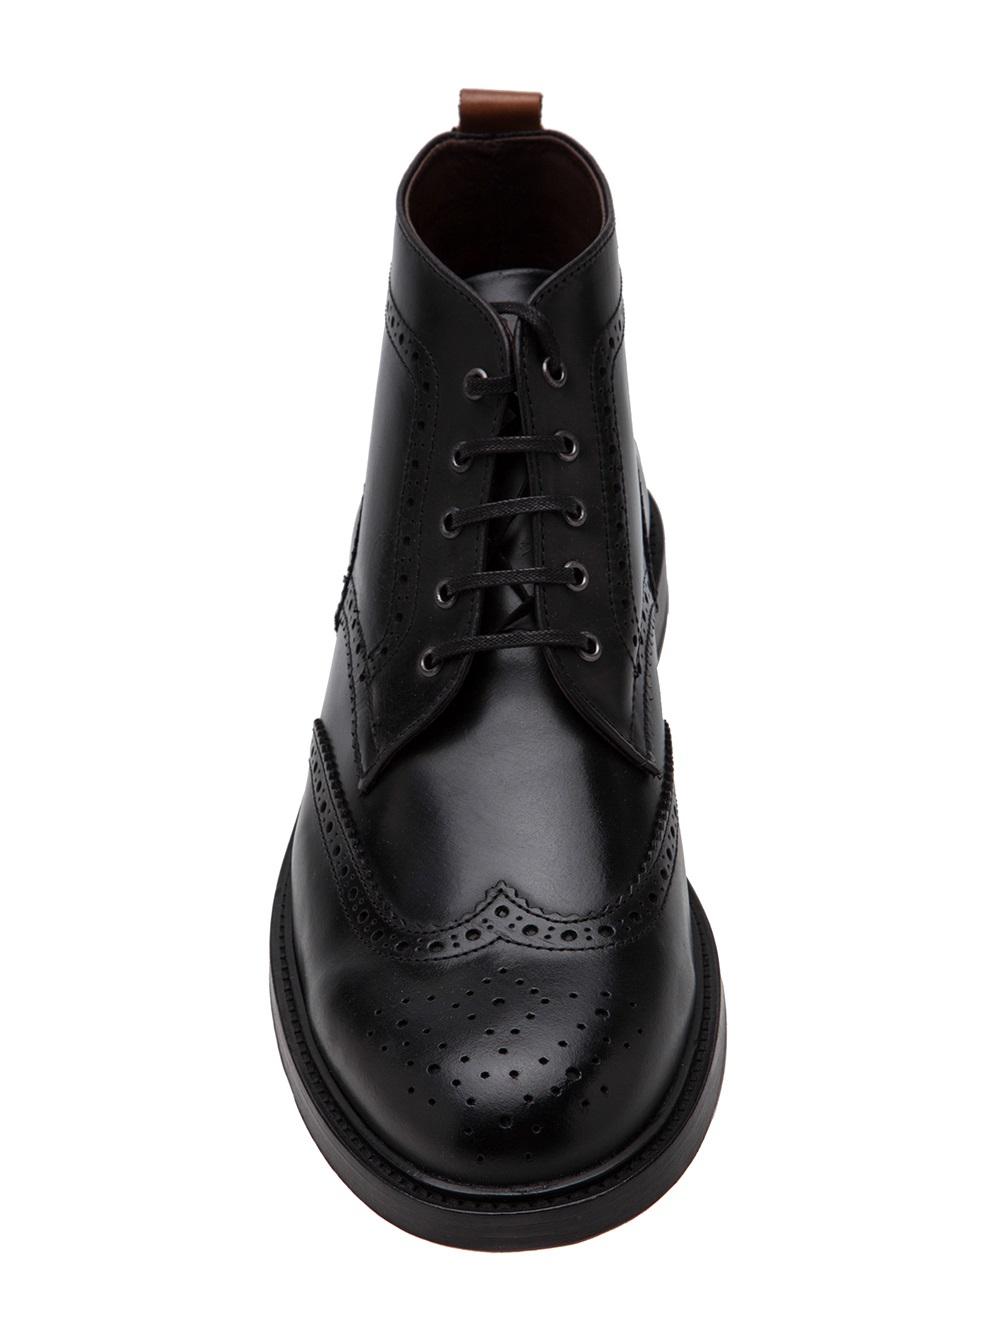 Lyst Royal Republiq Brogue Midcut Boot In Black For Men